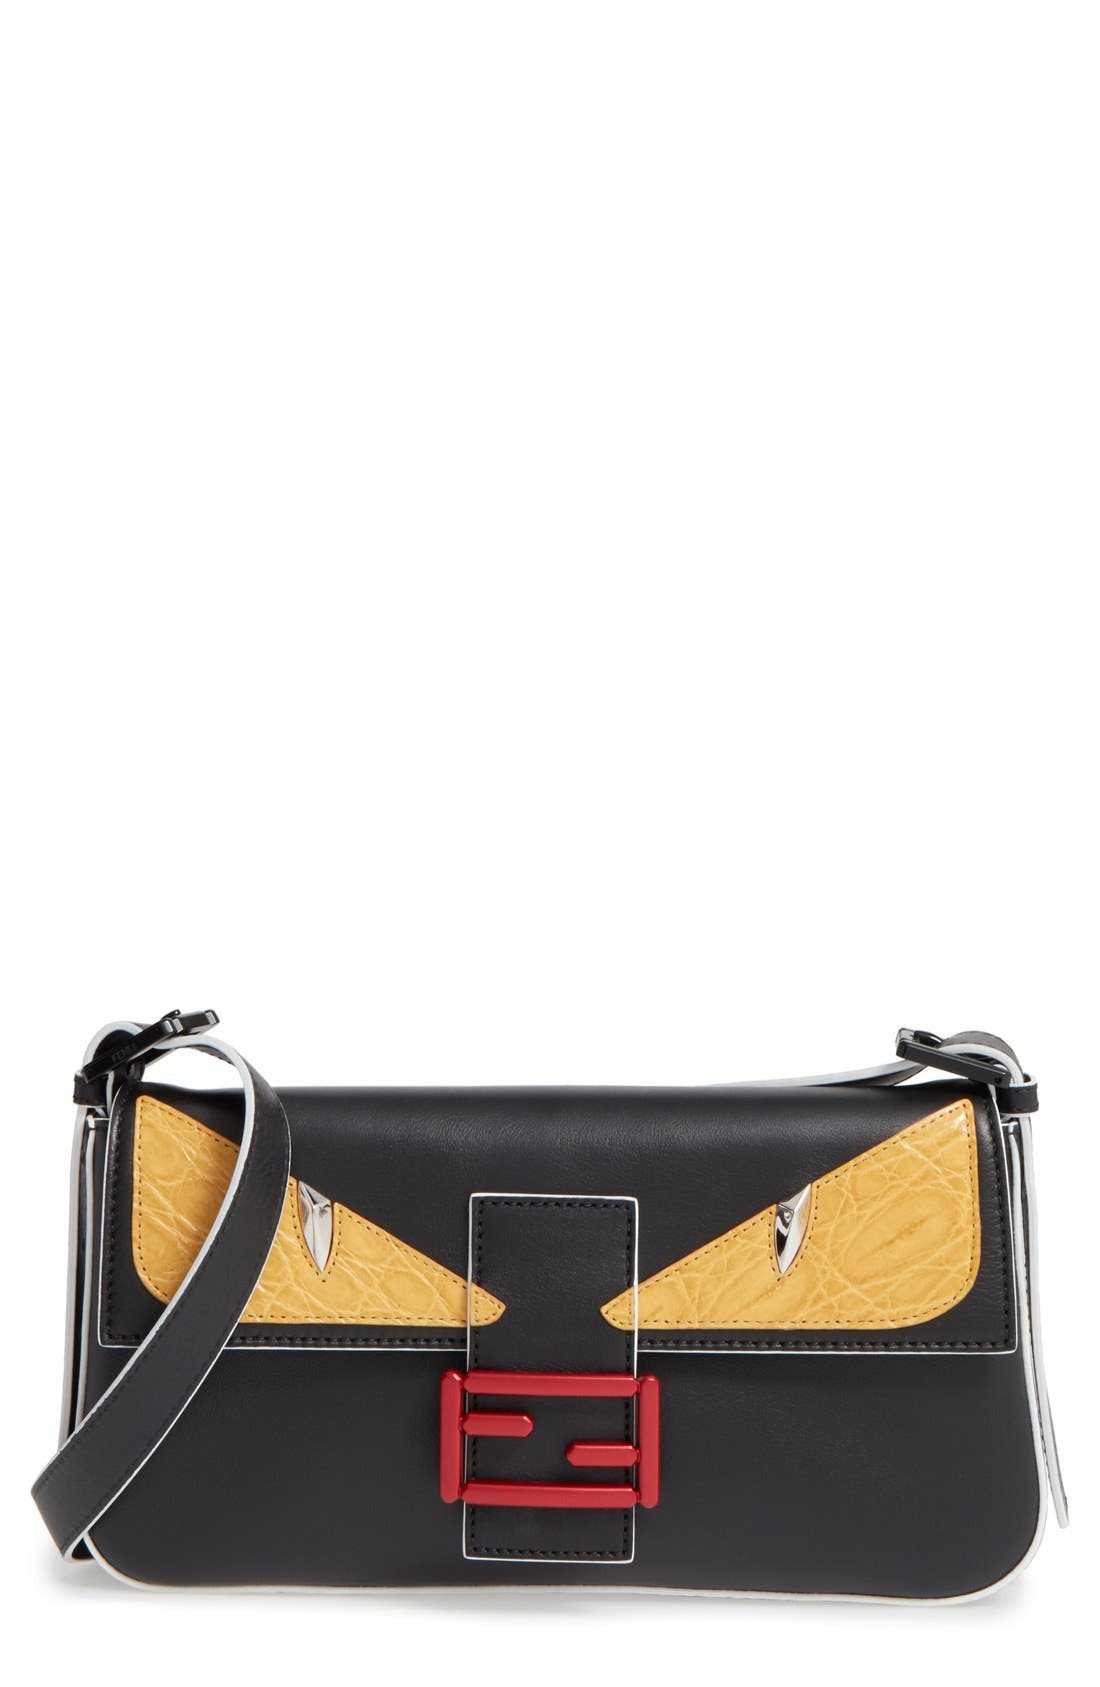 'Mini Monster' Leather Baguette,                         Main,                         color, 001